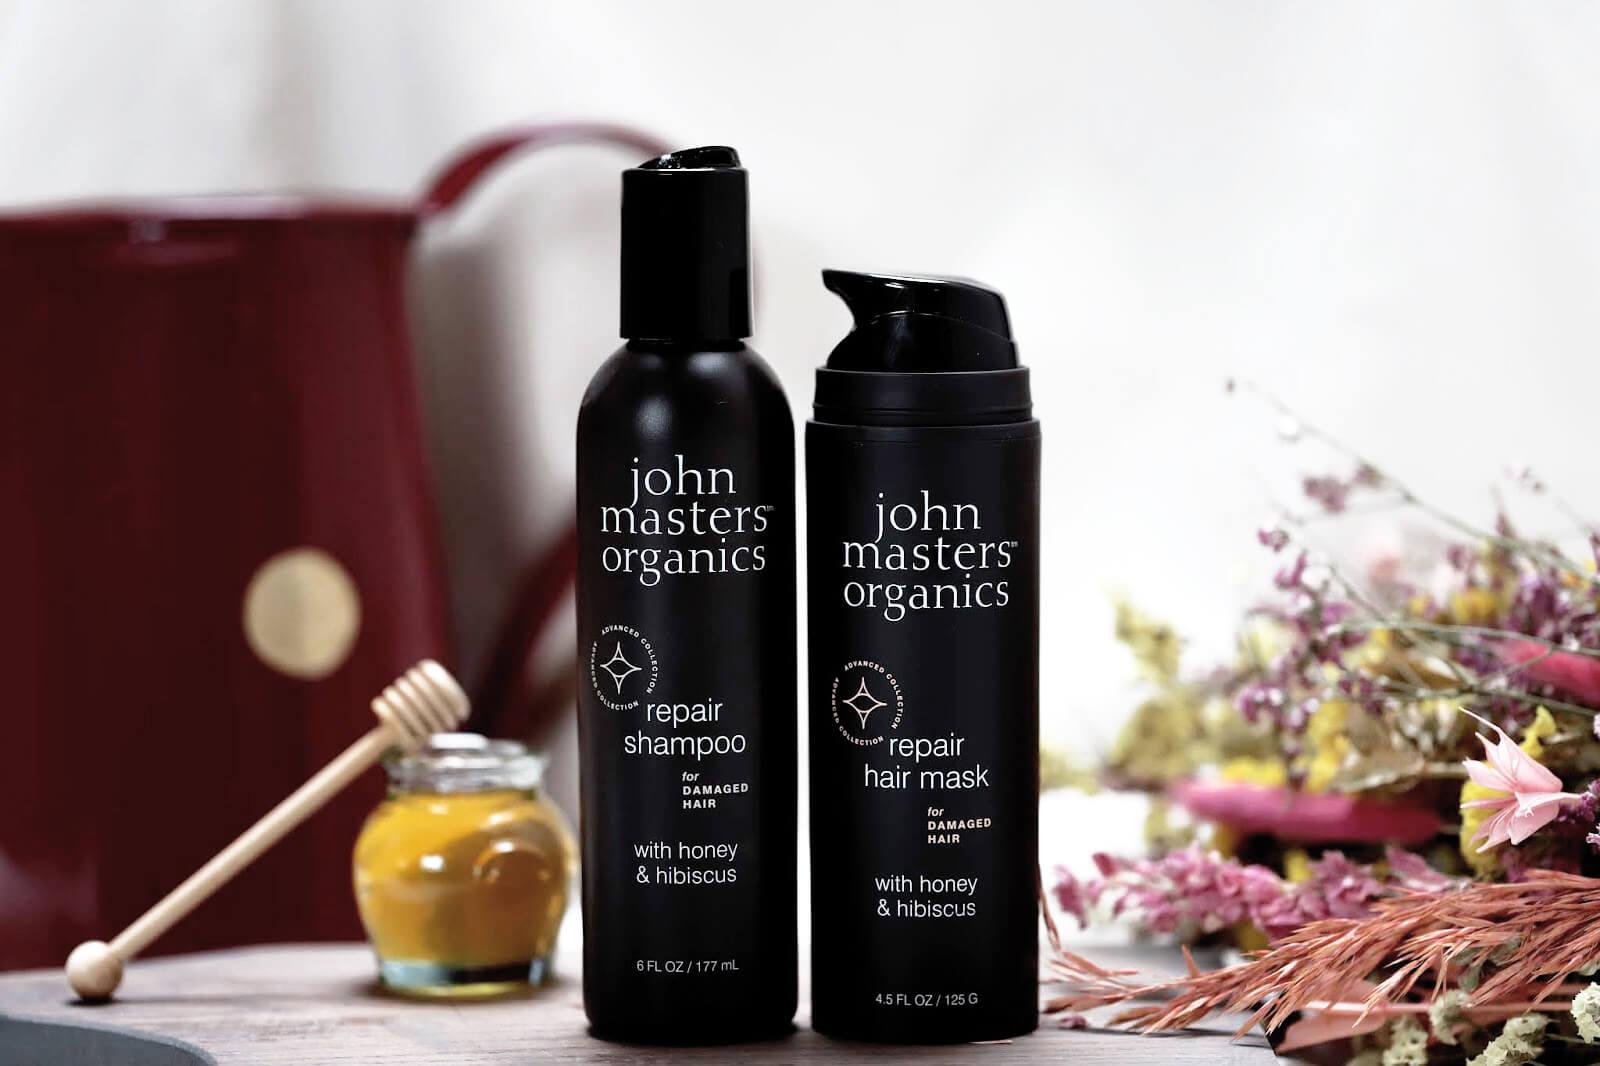 John Masters Organics Repair Shampooing Masque Avis